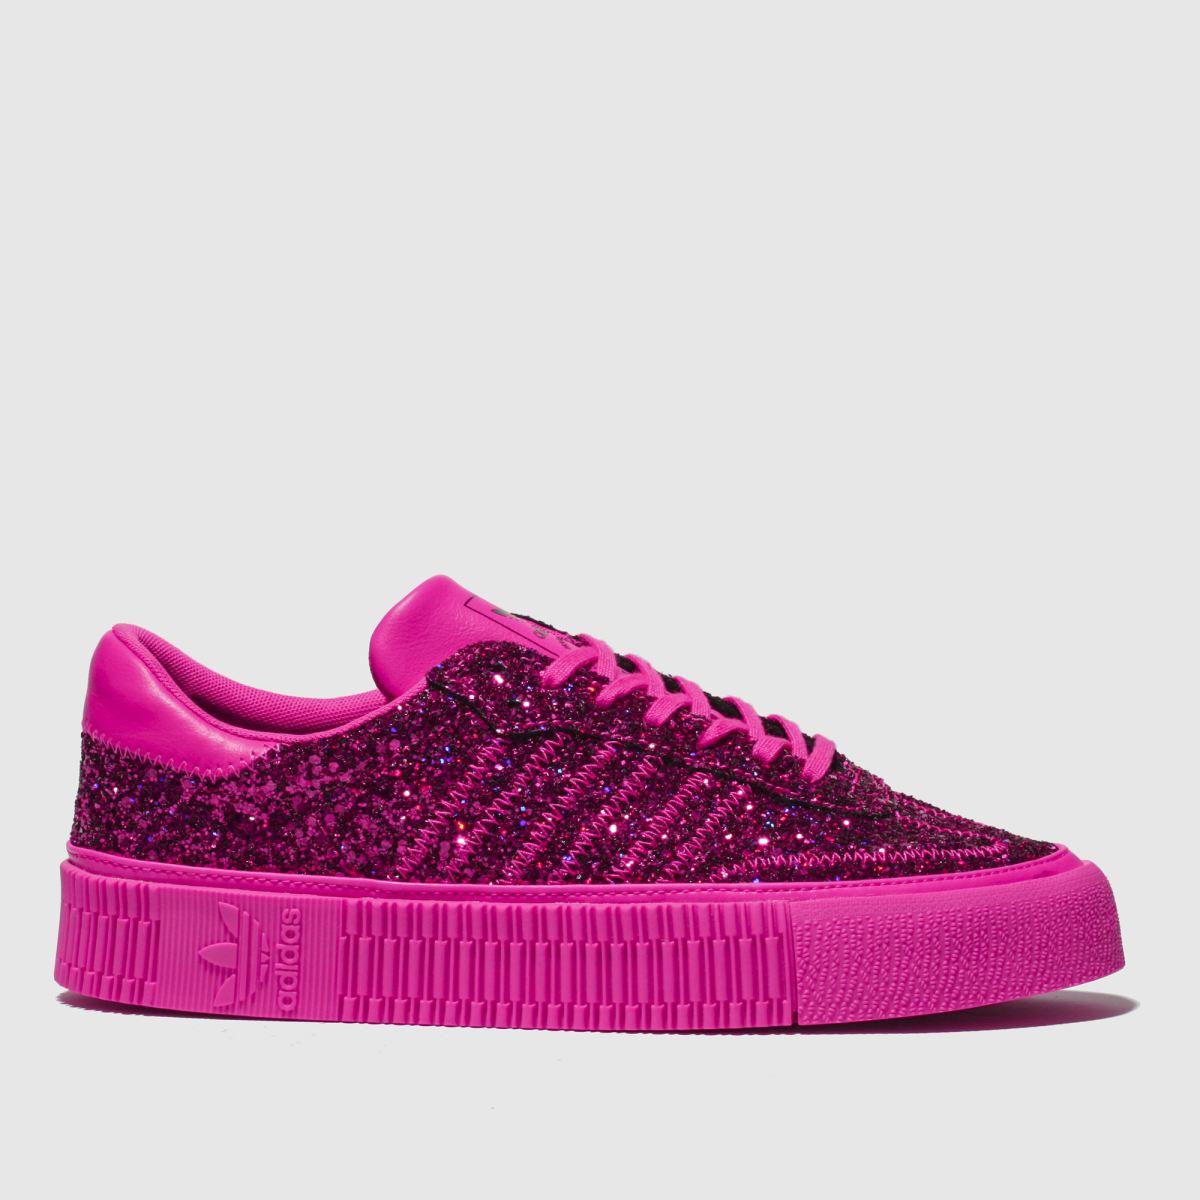 Adidas Pink Sambarose Trainers